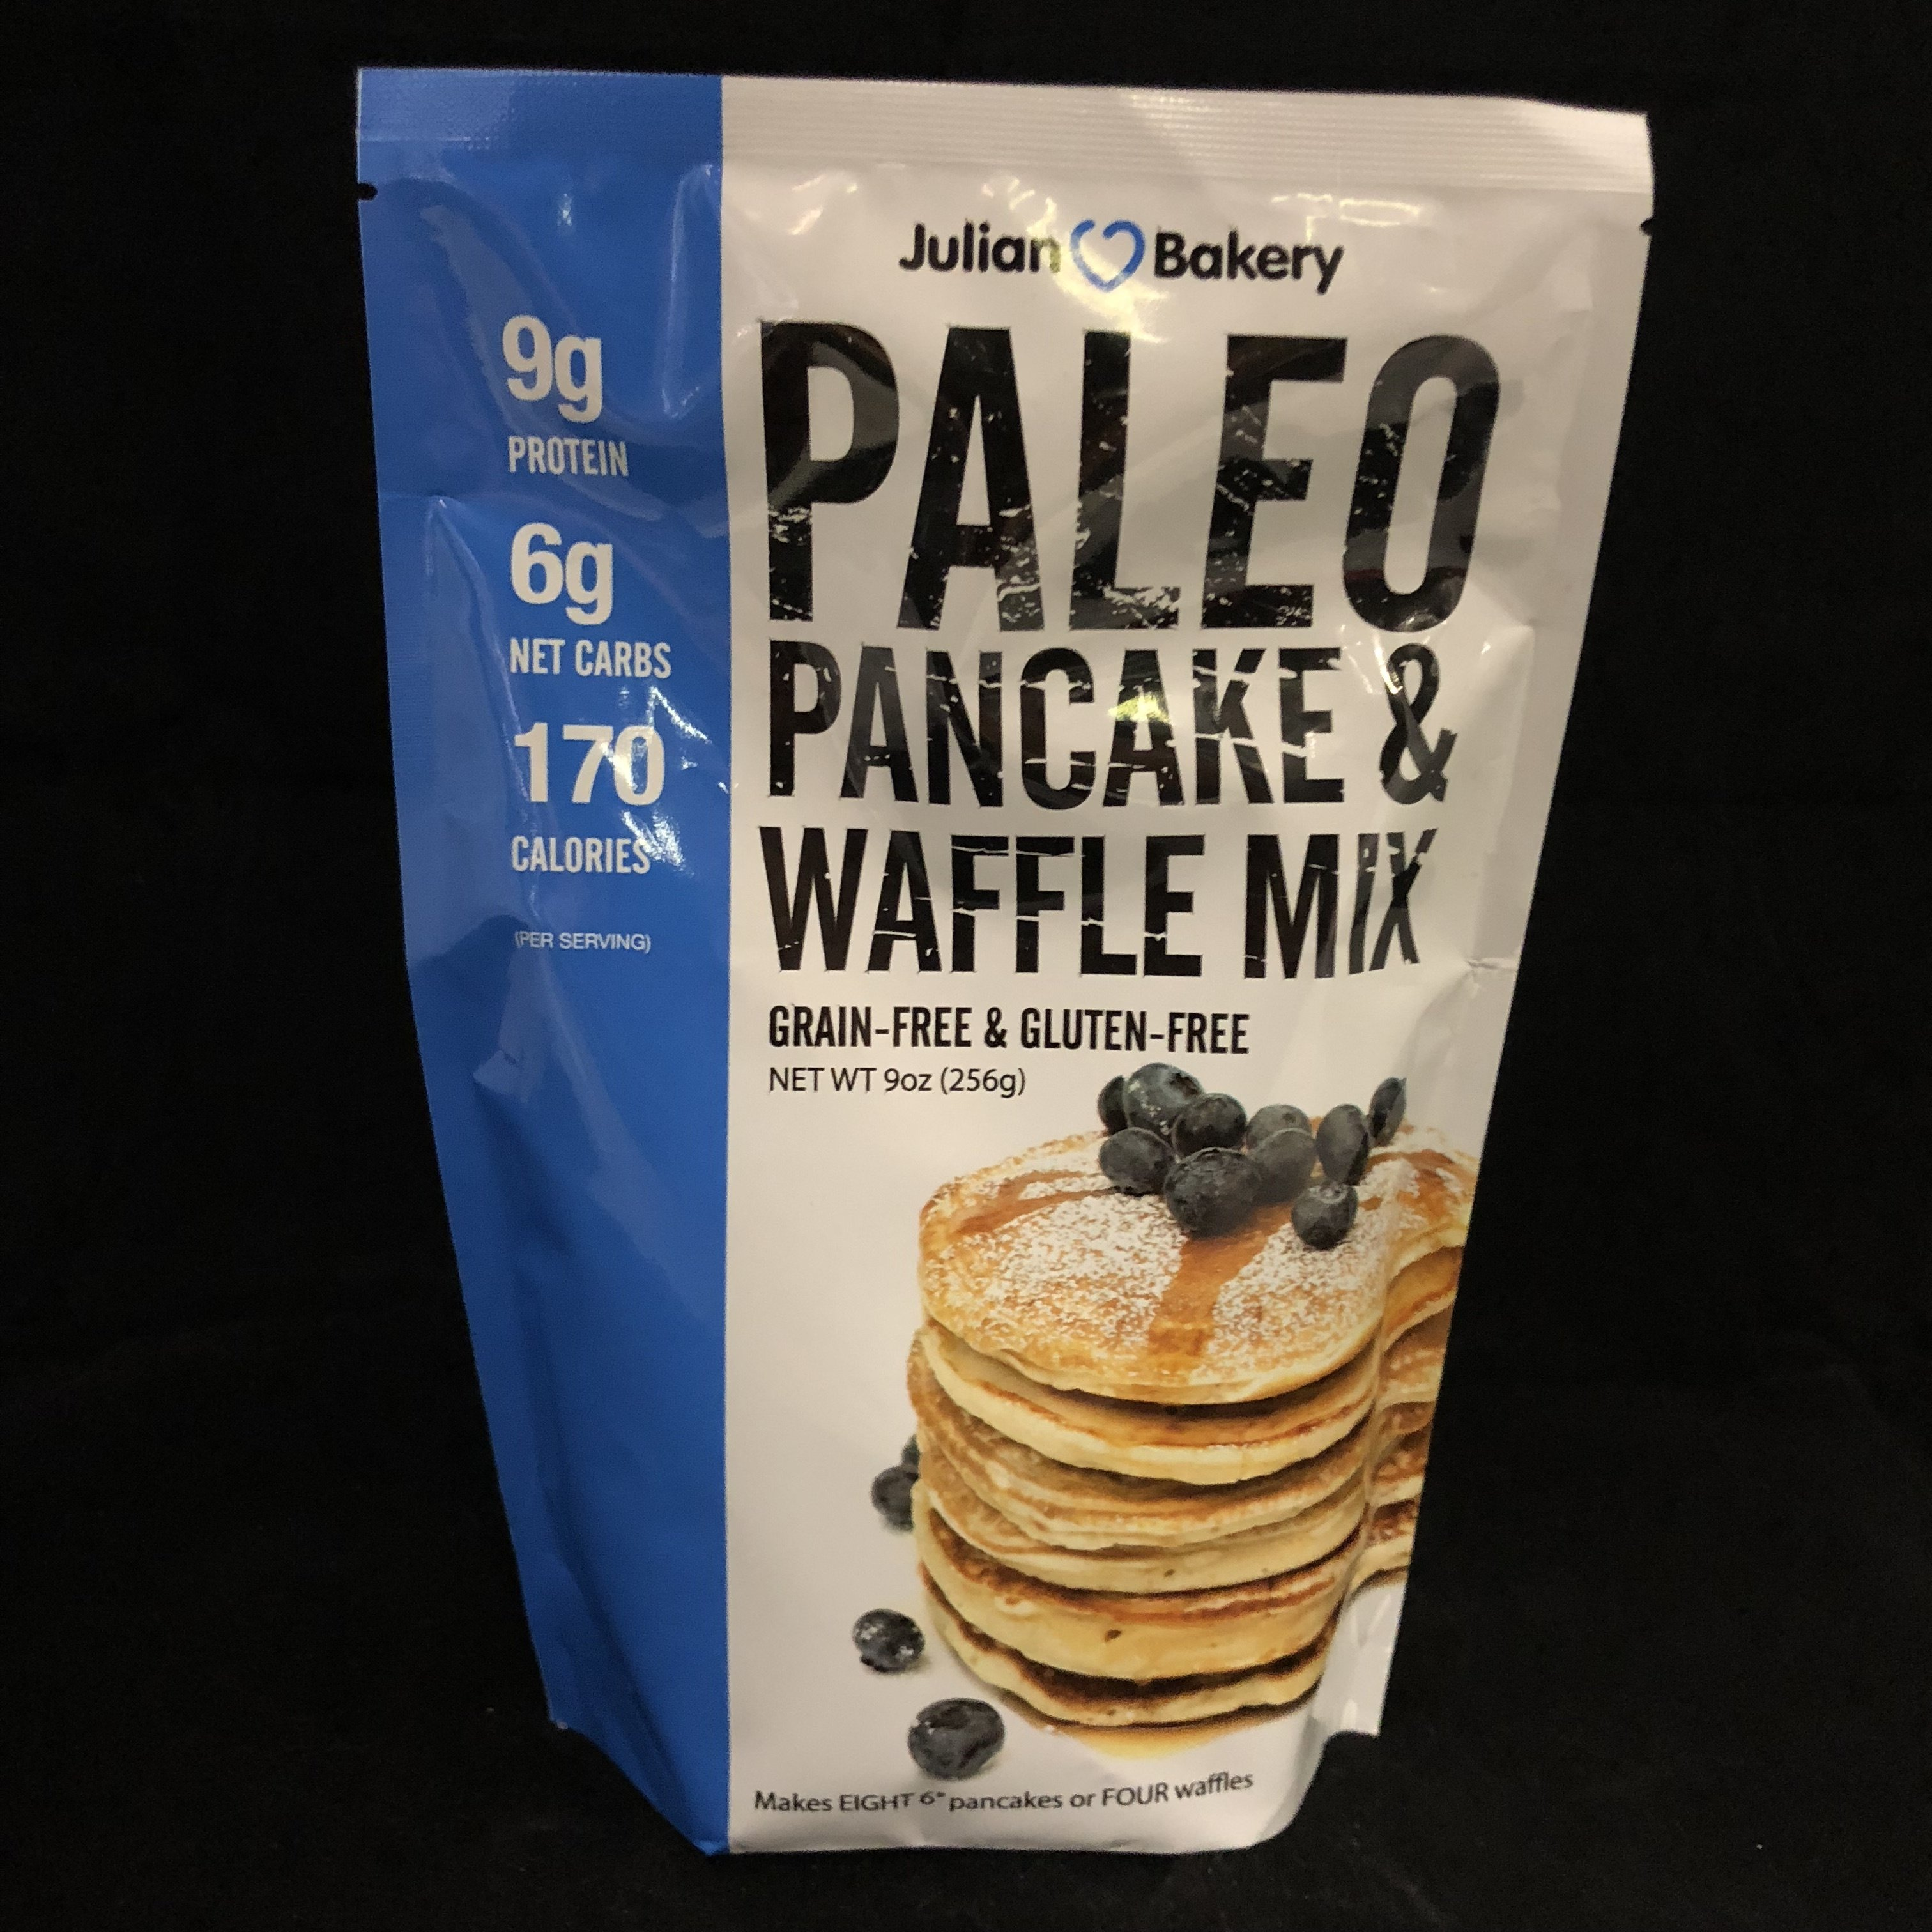 Paleo Pancake & Waffle Mix 813926002511